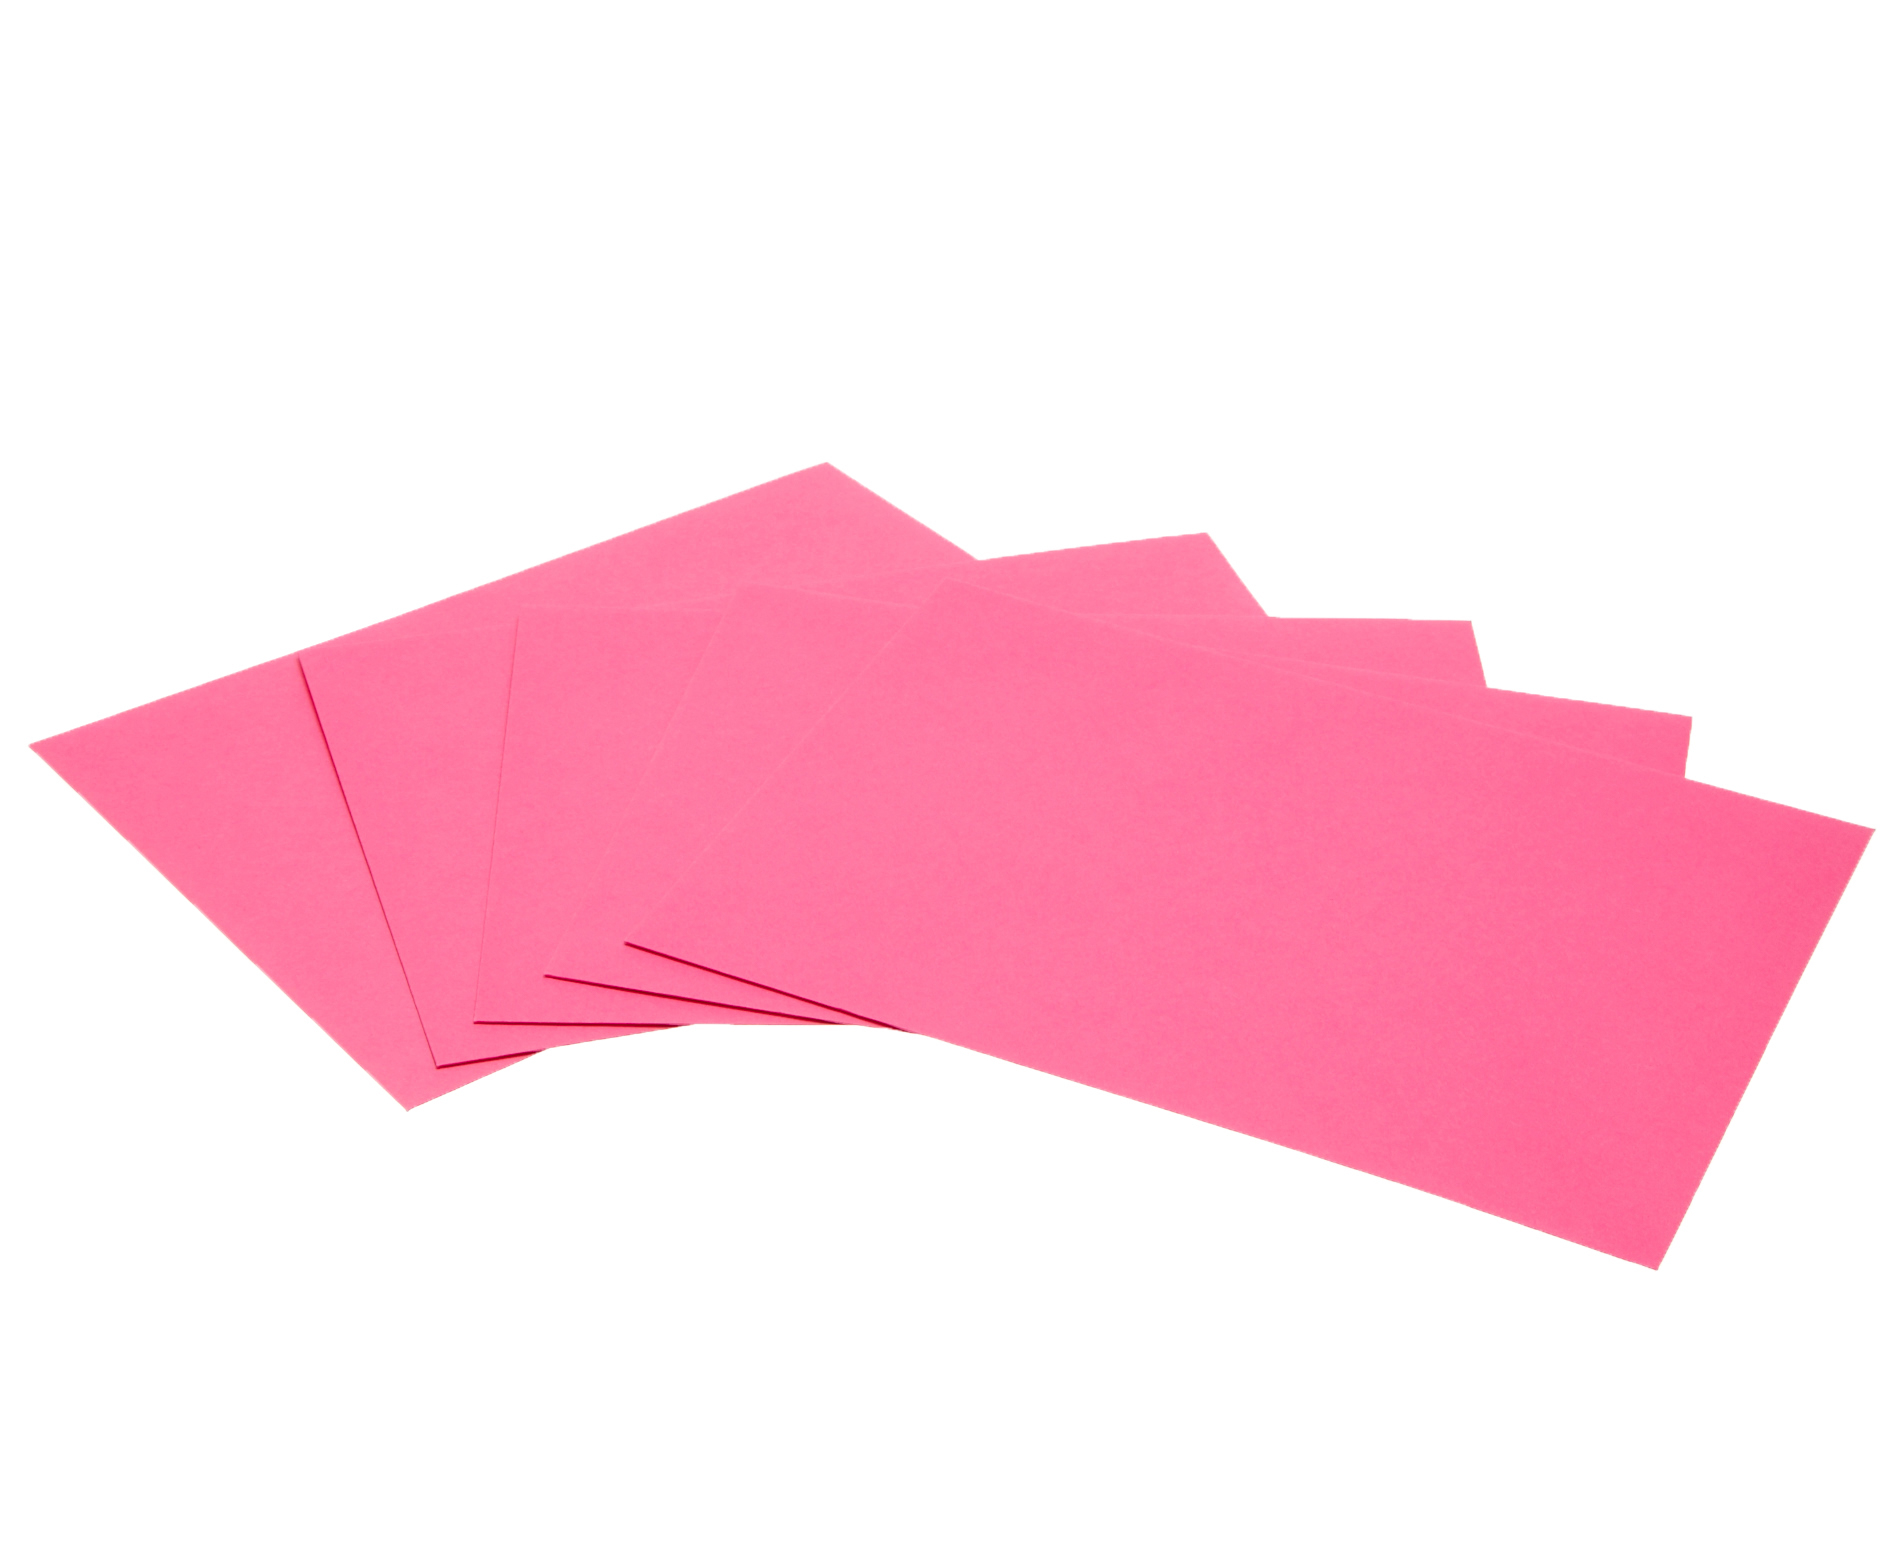 Envelope Origami Letters Coloured Envelopes Office Supplies Ryman